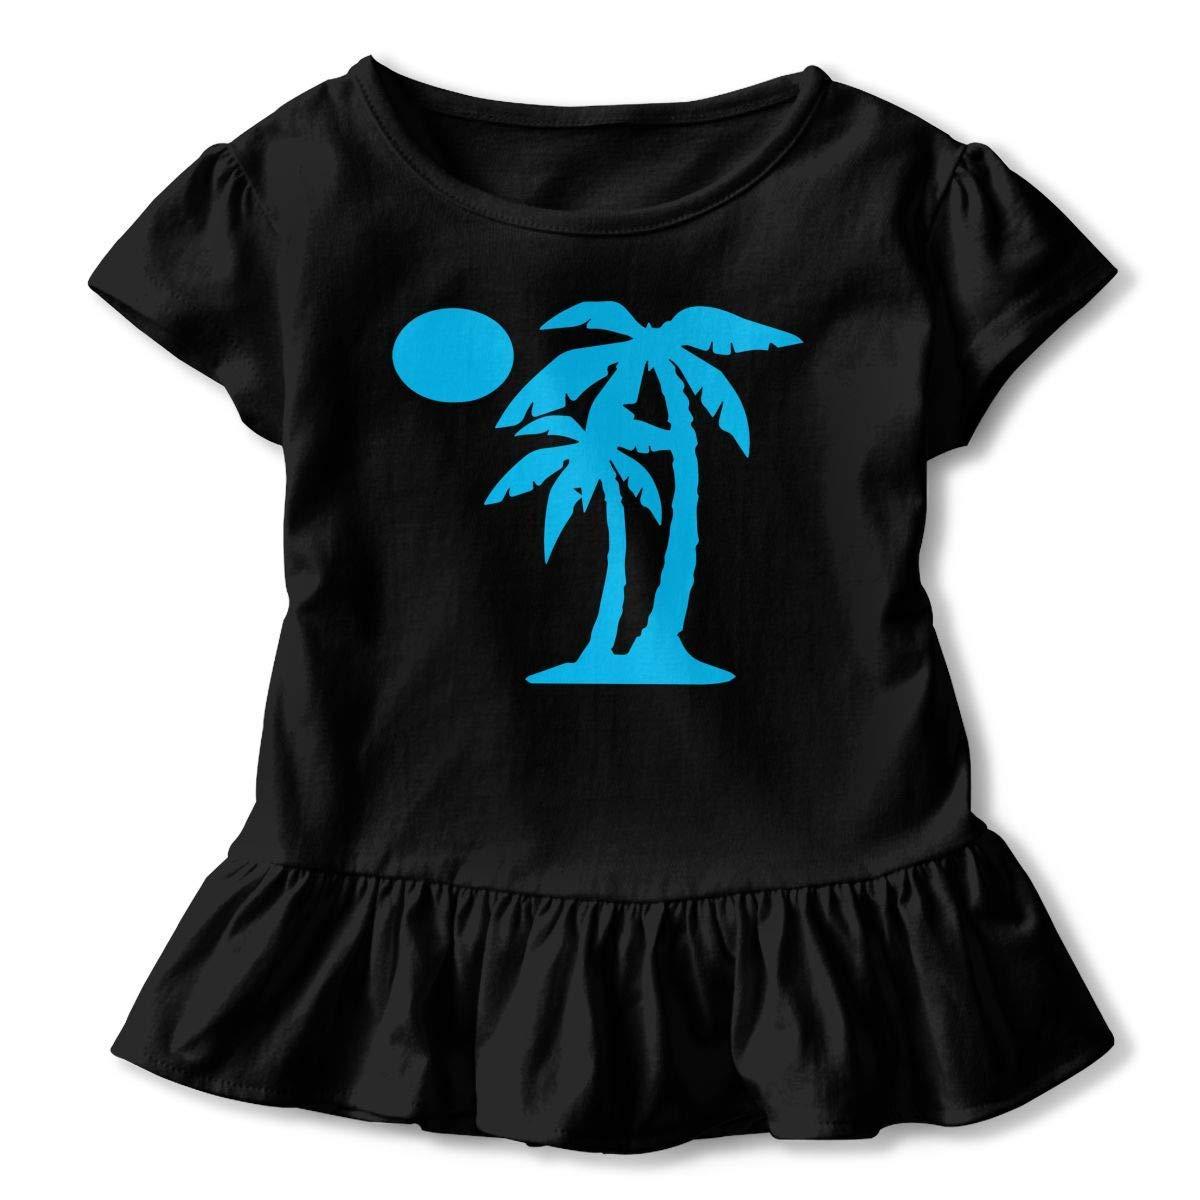 Kawaii Tunic Shirt Dress with Falbala PMsunglasses Short Sleeve Palm Tree T-Shirts for Girls 2-6T